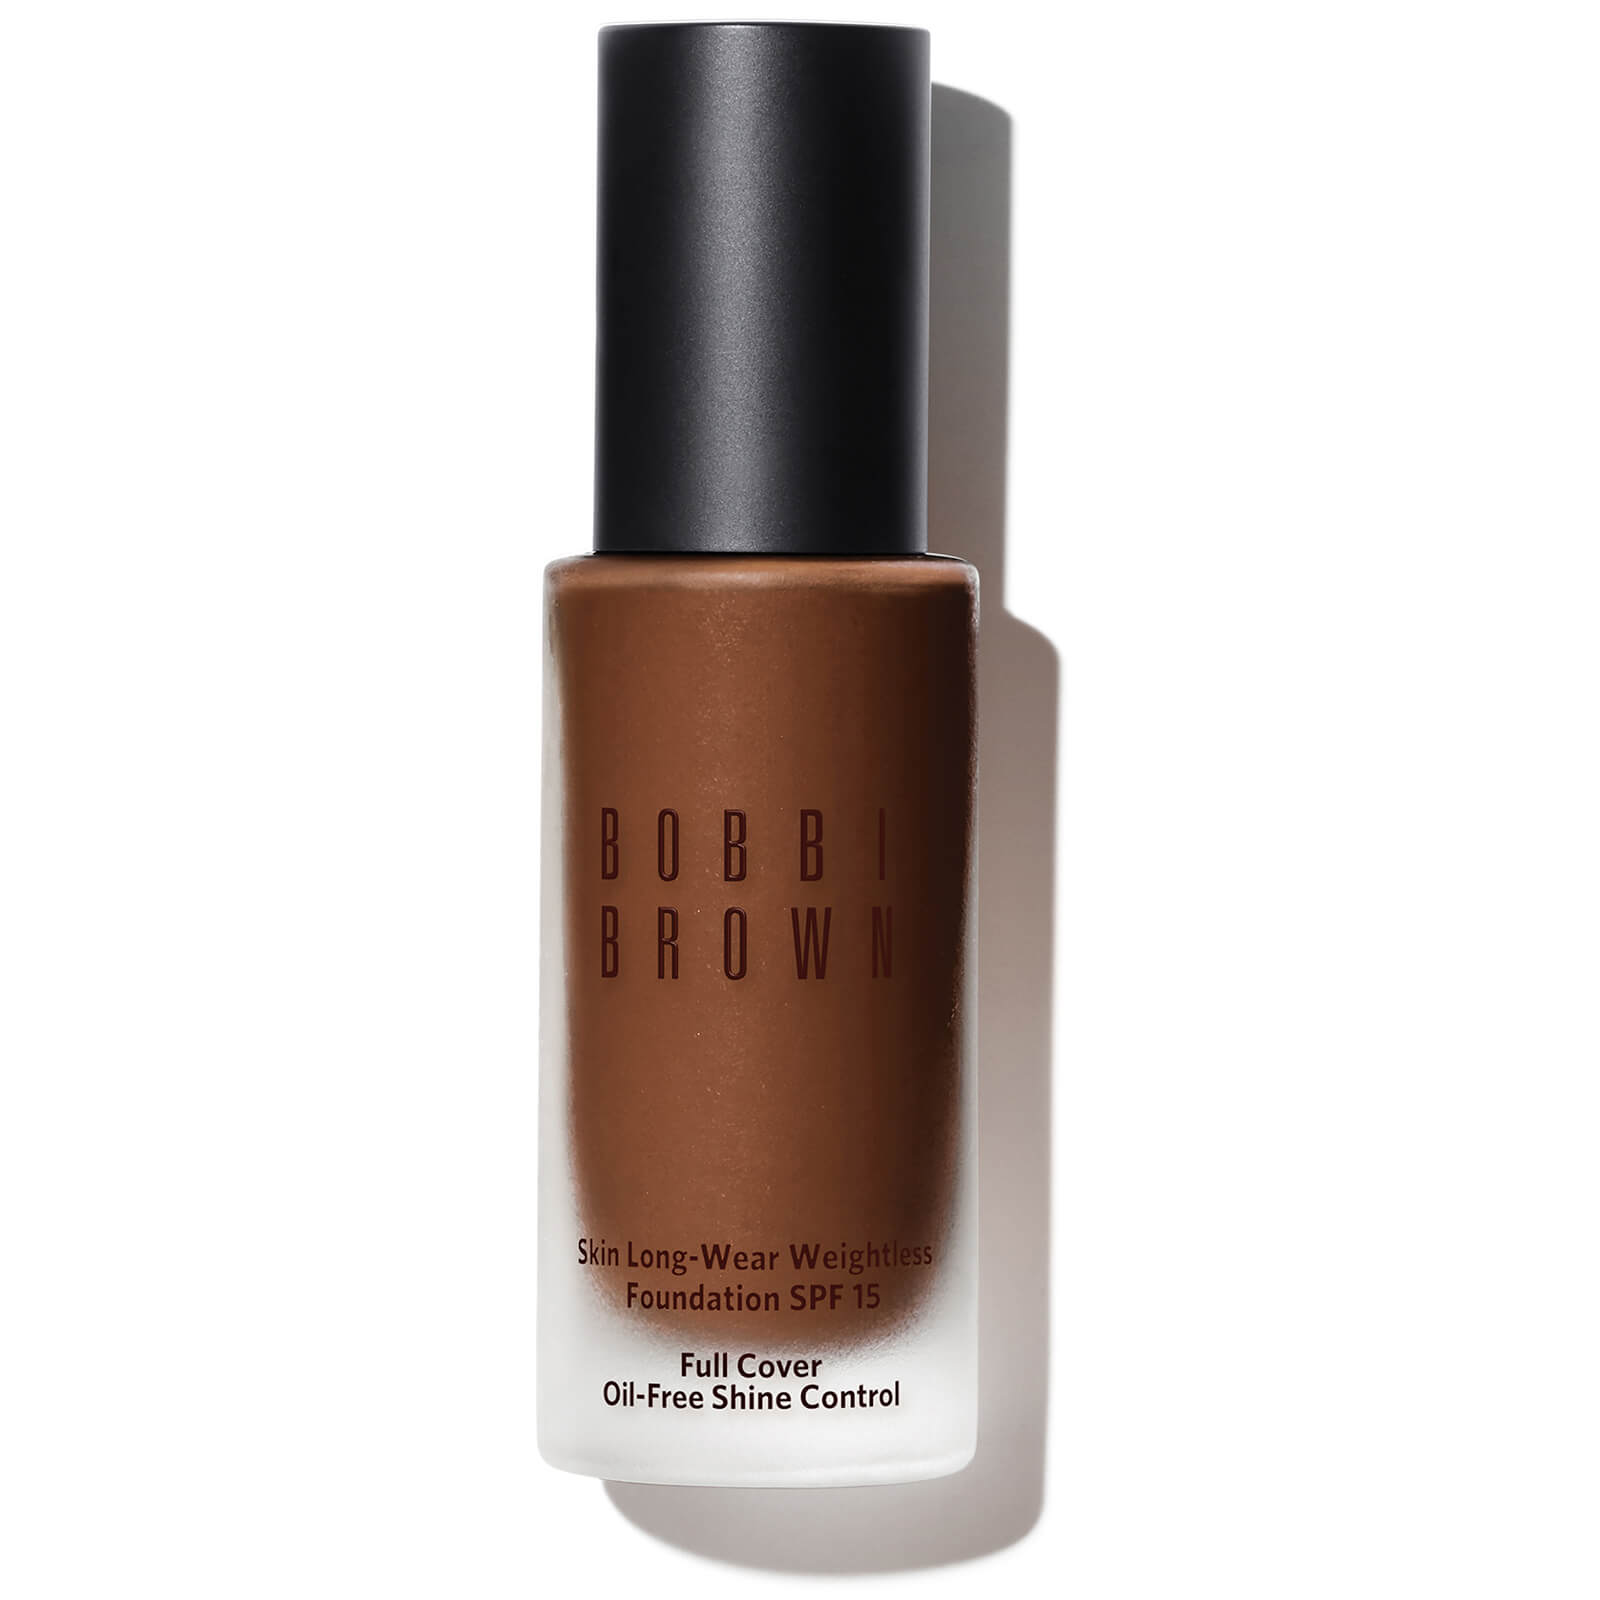 Bobbi Brown Skin Long-Wear Weightless Foundation SPF15 (Various Shades) - Neutral Walnut